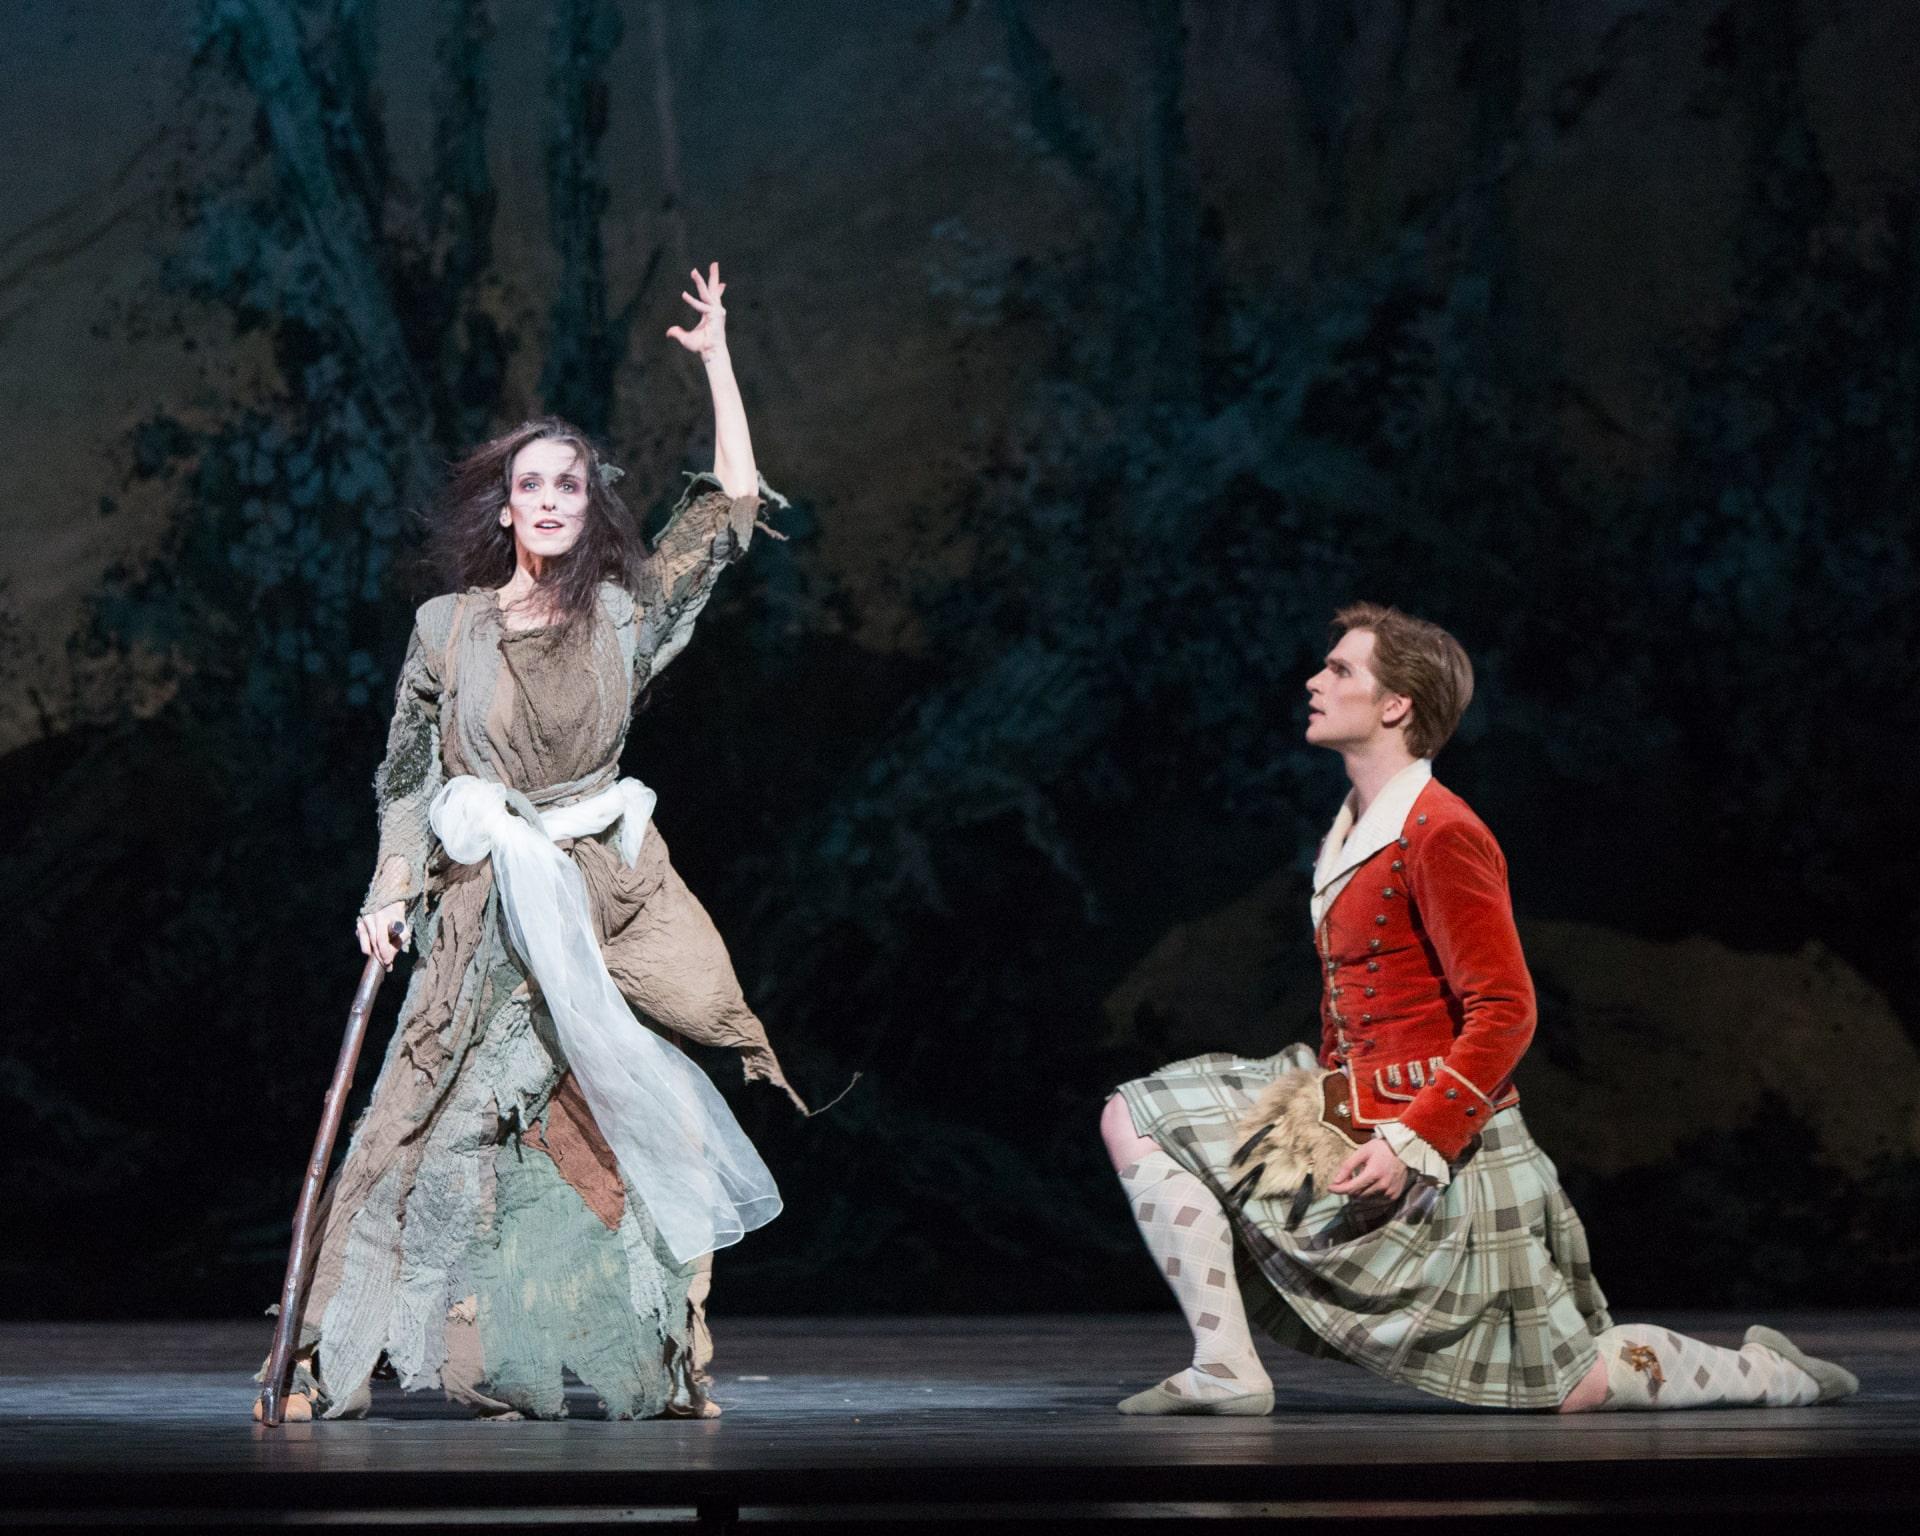 Ballerina in dress of rags gestures upward watched by kneeling dancers in kilt and red jacket.